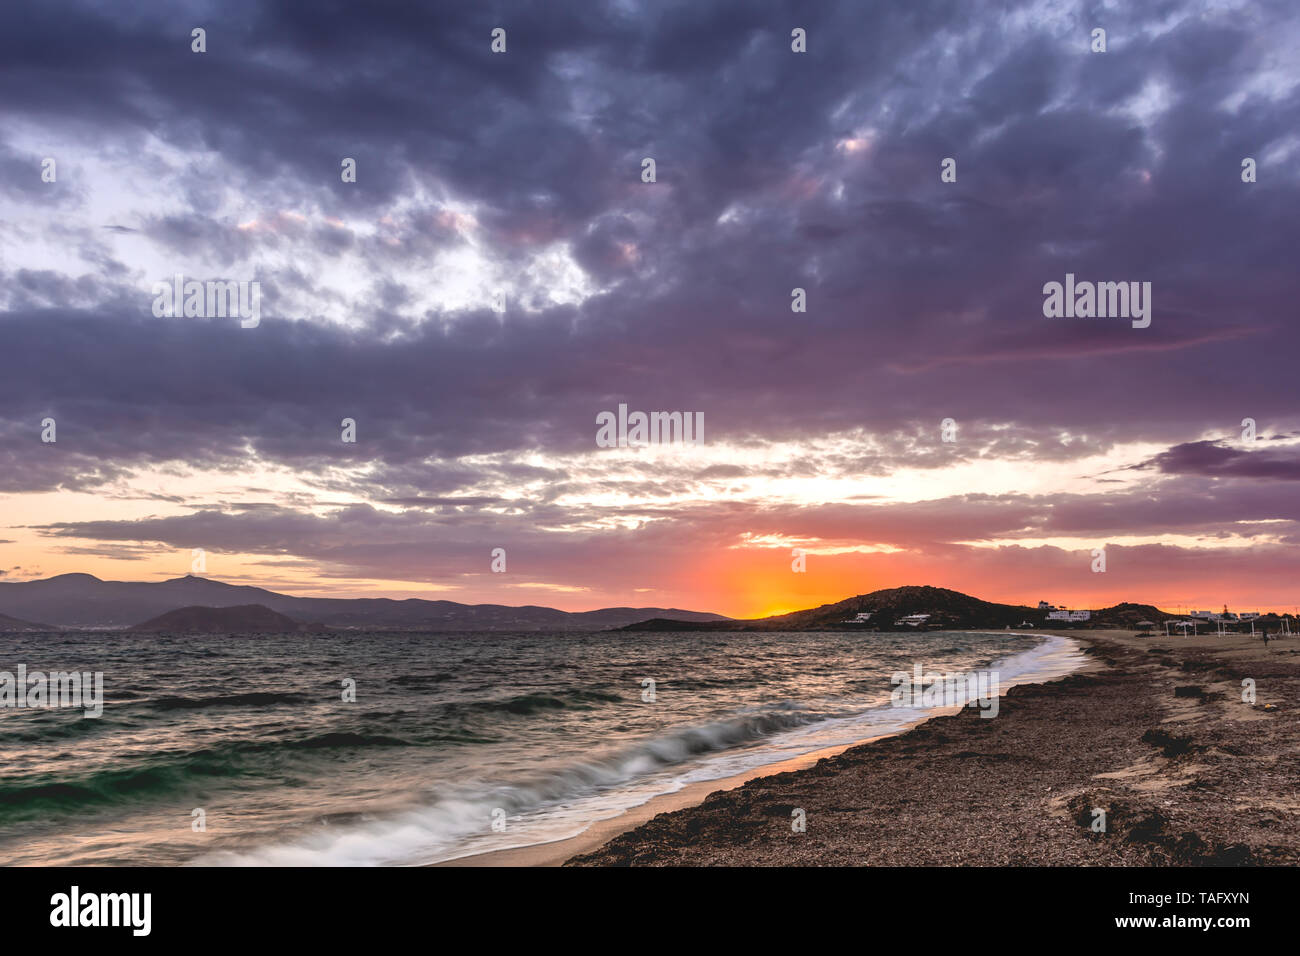 Sunset behind the Cyclades at Agios Prokopios beach, Naxos, Greece Stock Photo